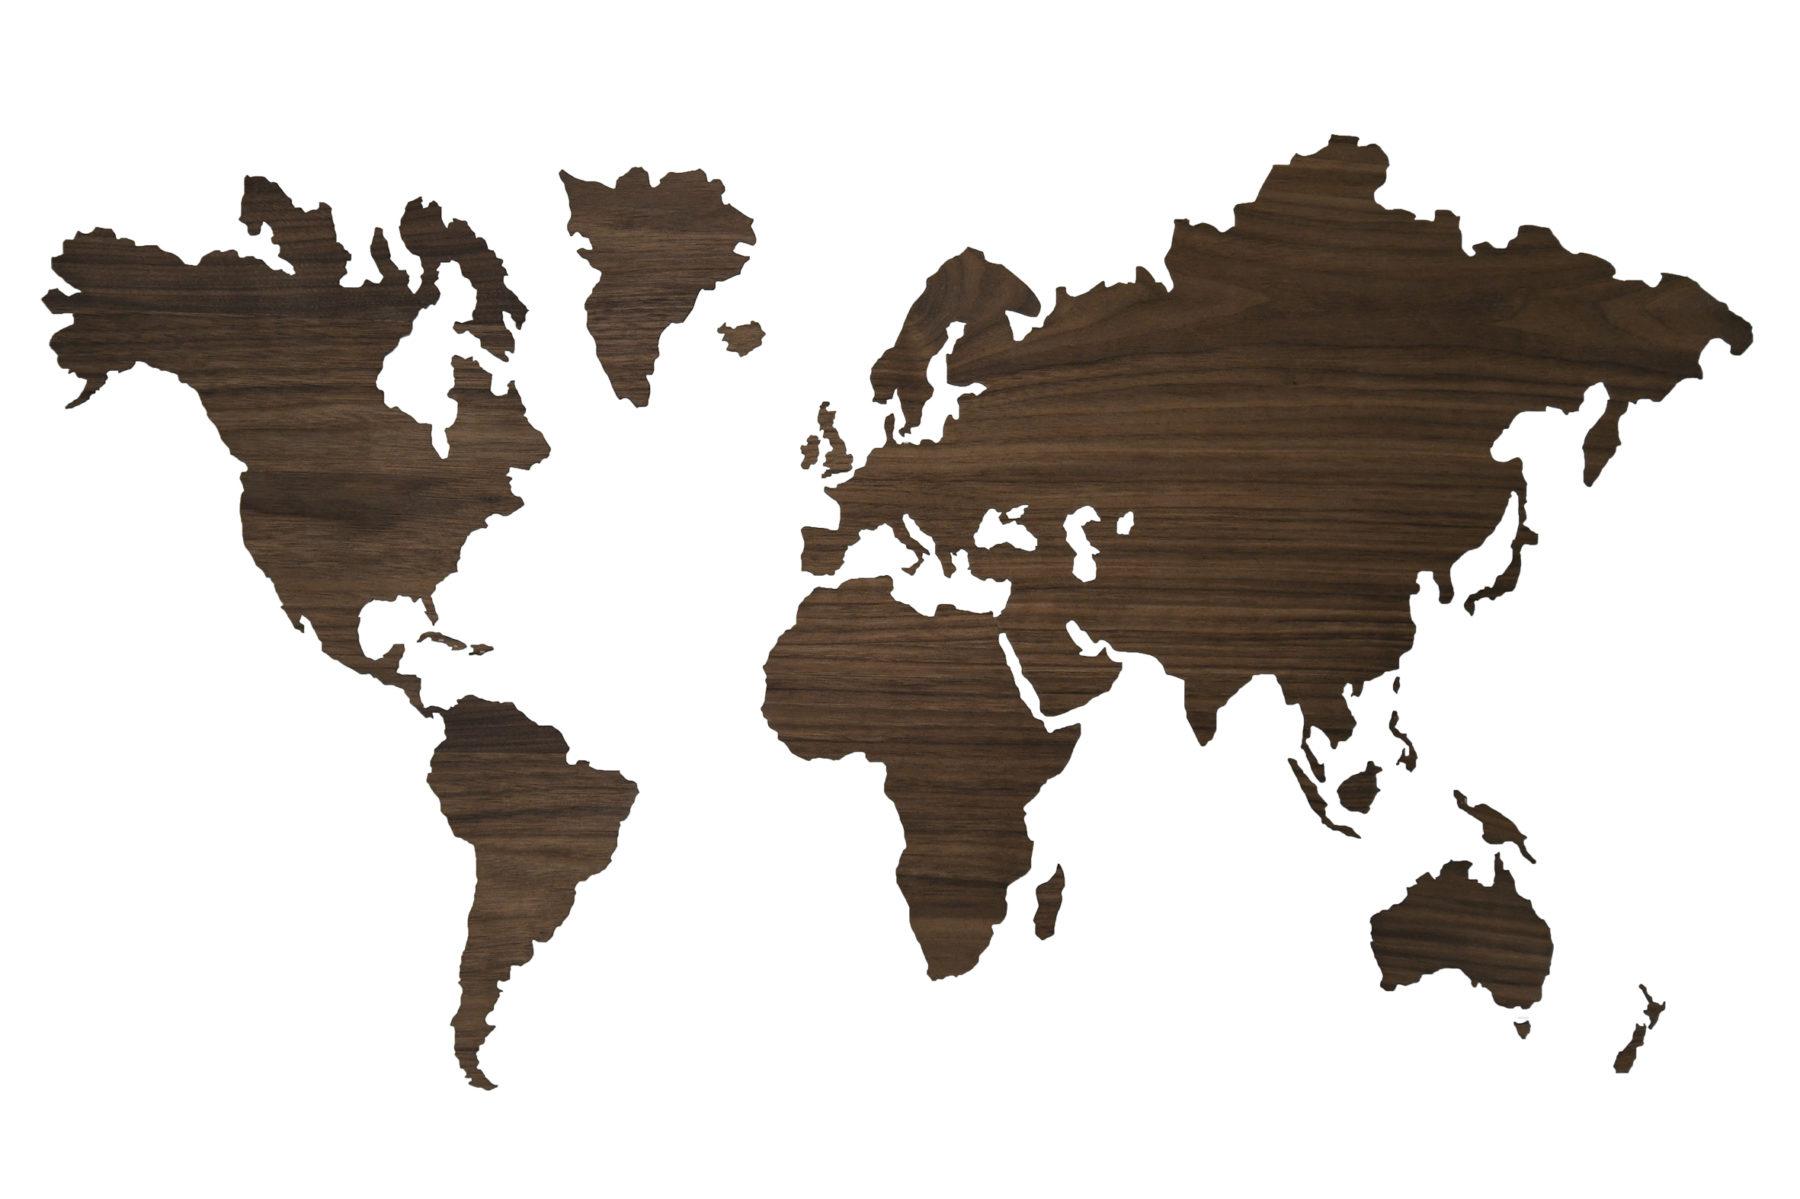 Noten houten sticker wereldkaart